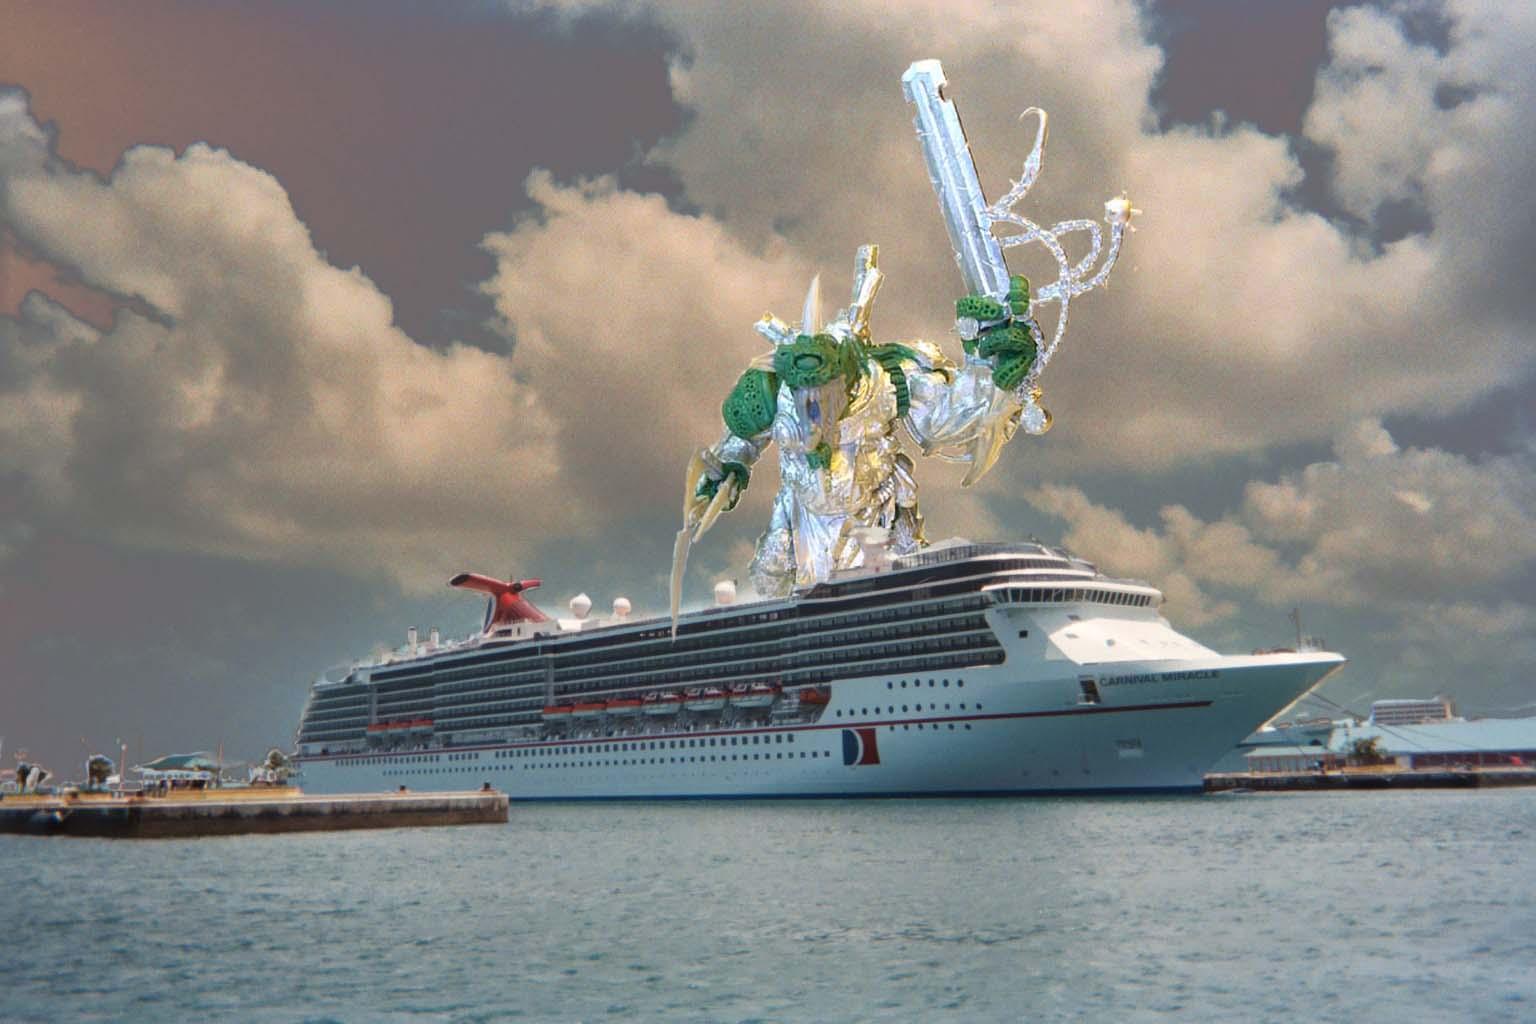 Cruise Ship Disaster By Truevampire On DeviantArt